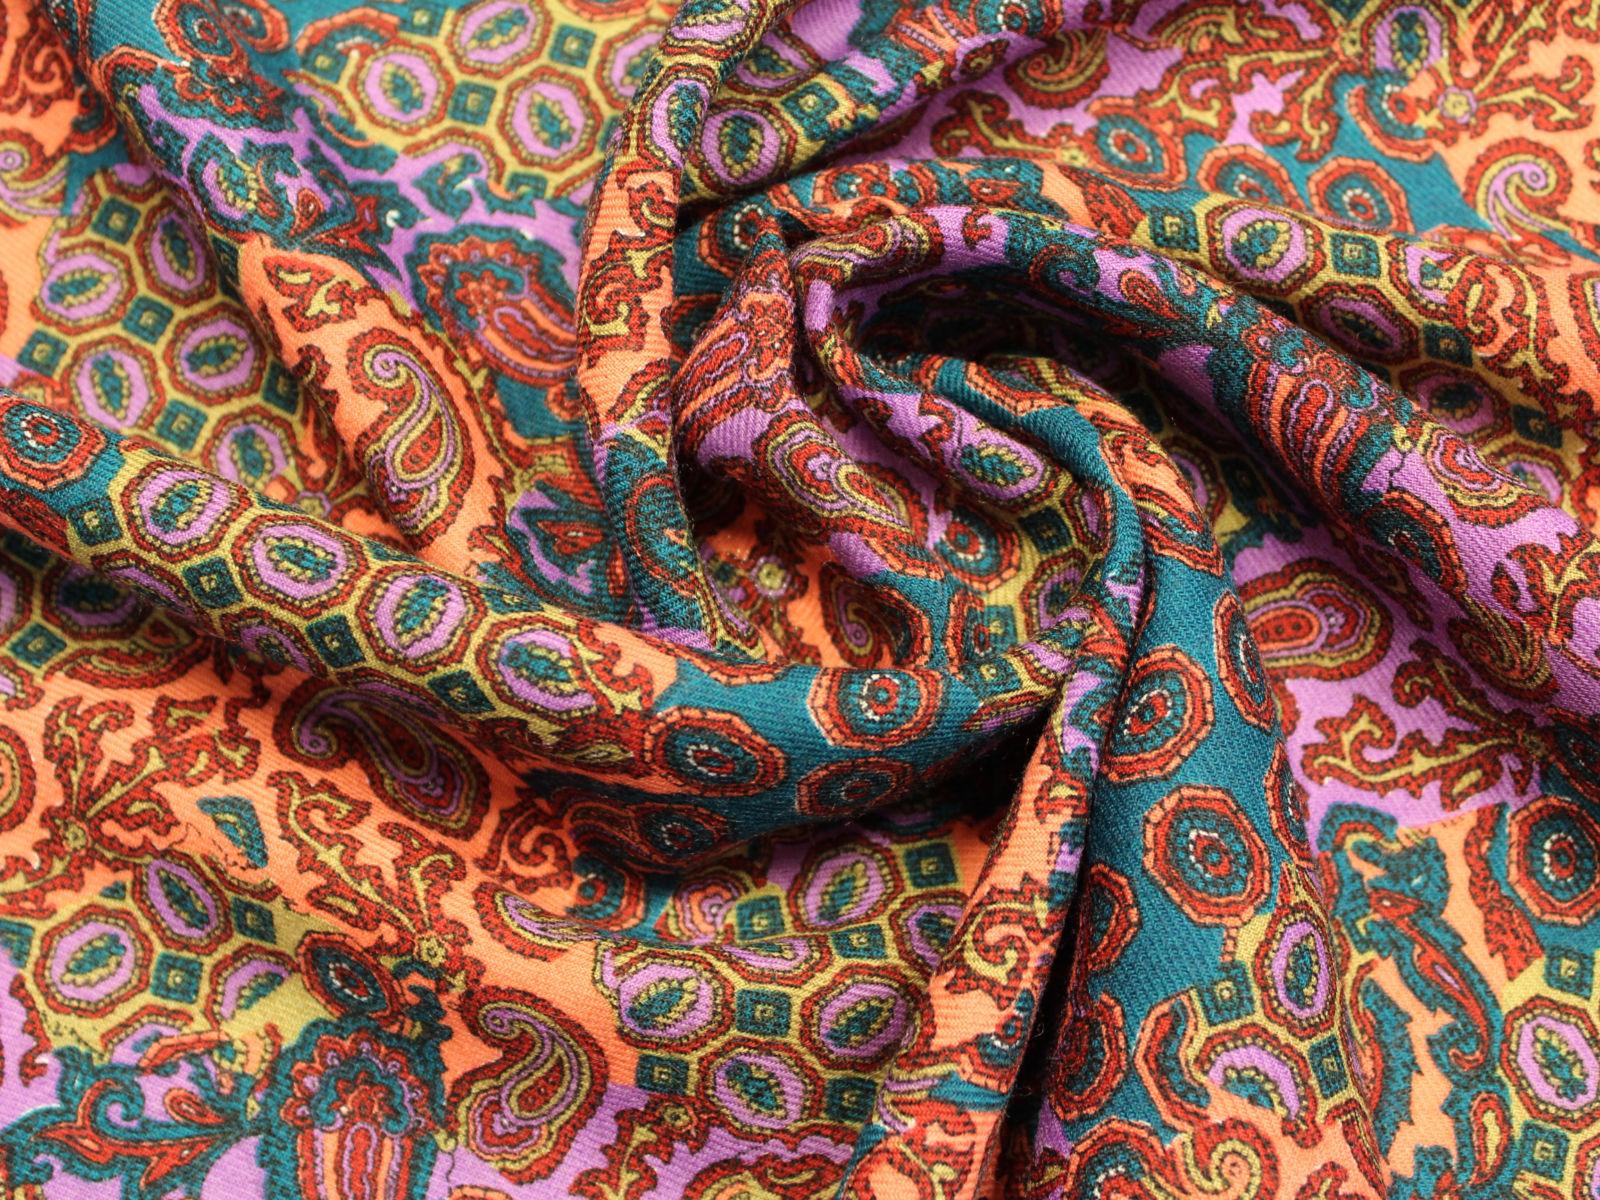 Cachemire geometrico giusti tessuti for Vendita tessuti arredamento on line